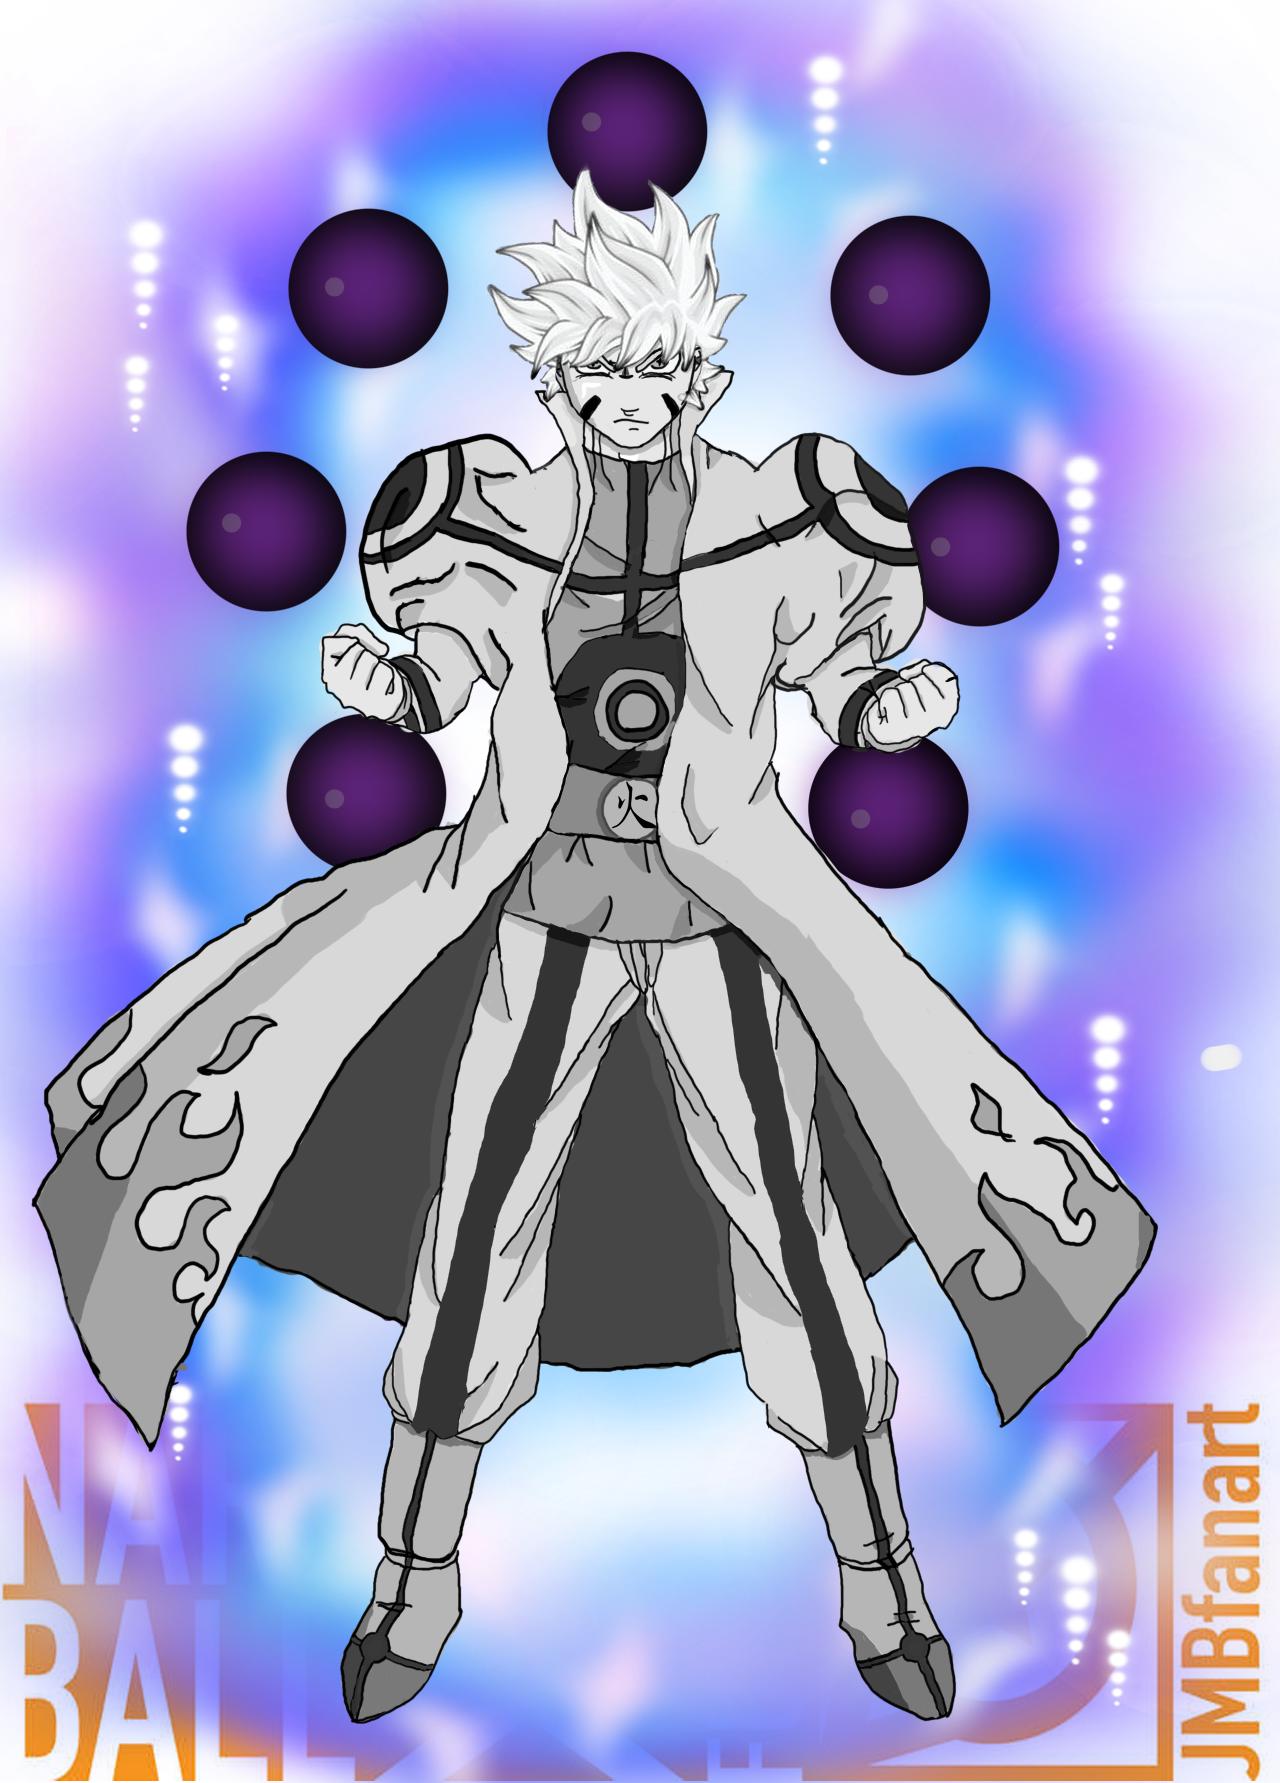 Goruto Mui Six Paths Sage Mode Complete Kcm By Rebirtharts On Deviantart Dragon Ball Artwork Anime Crossover Dragon Ball Super Goku